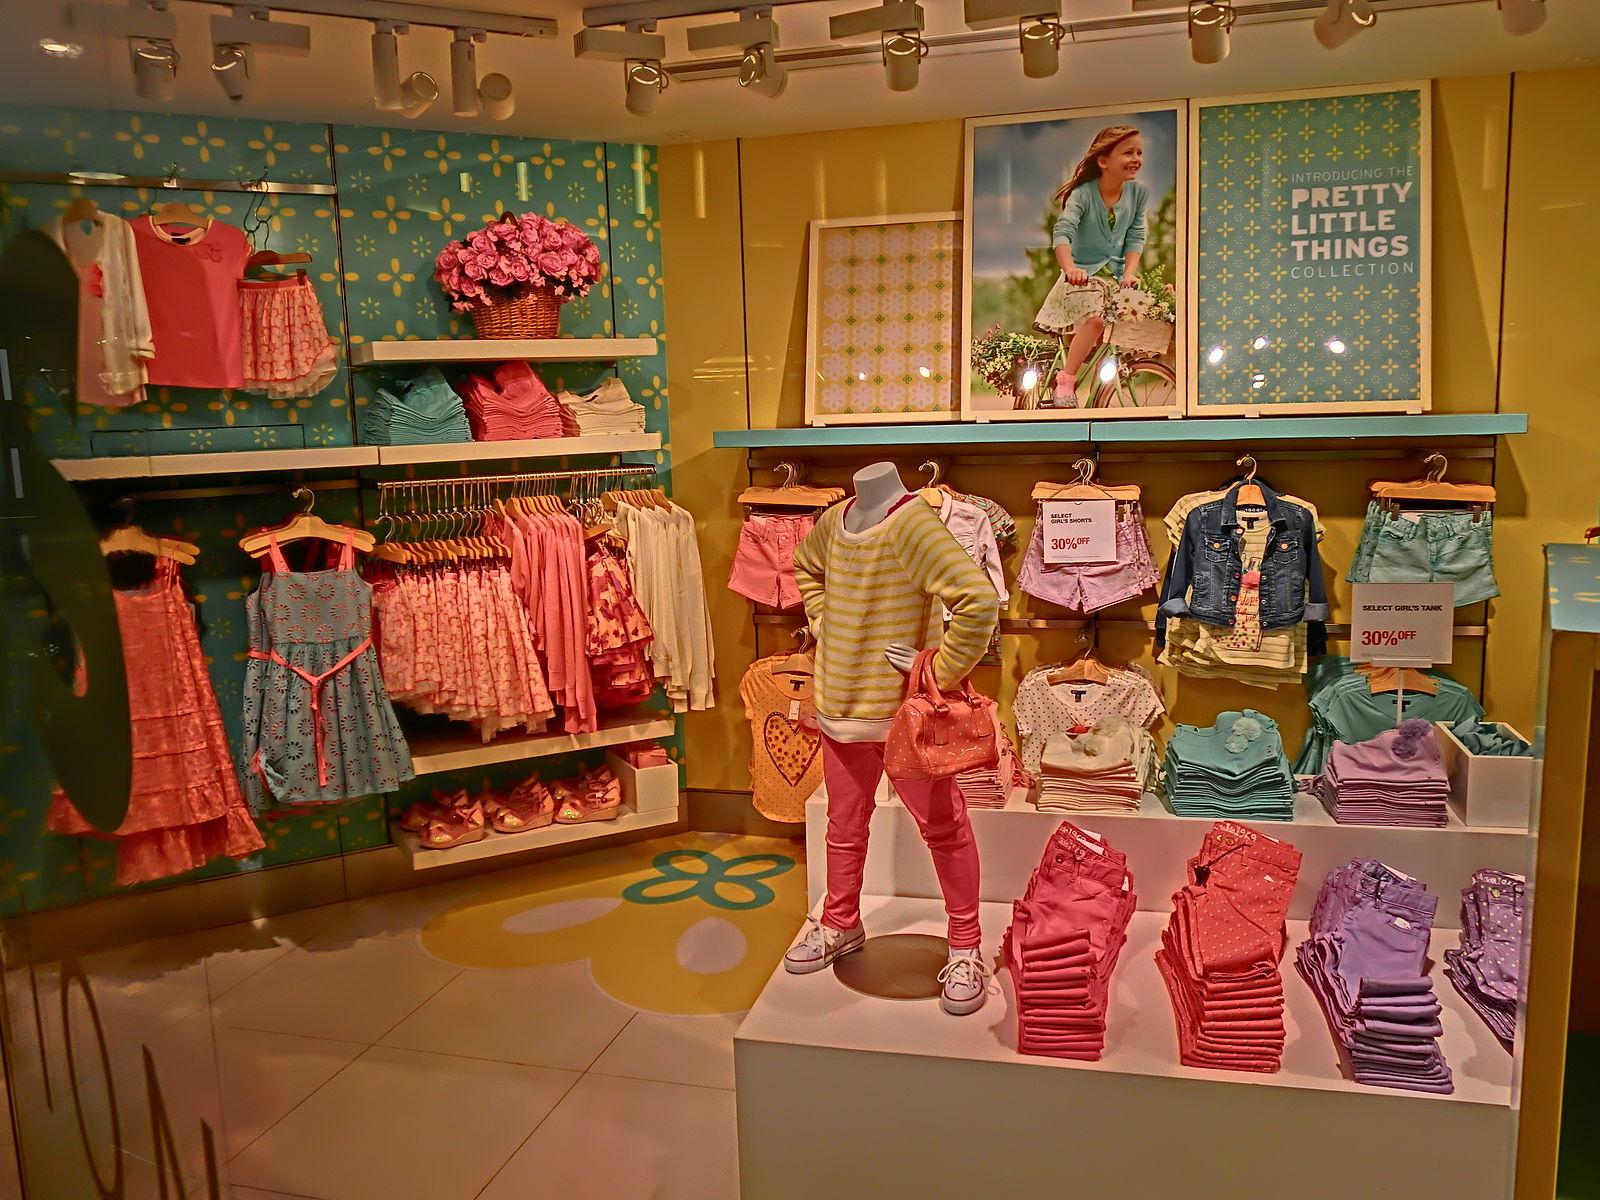 Former SVP of Marketing for Victoria's Secret PINK Brand Joins 'Tween' Retailer Justice as CMO